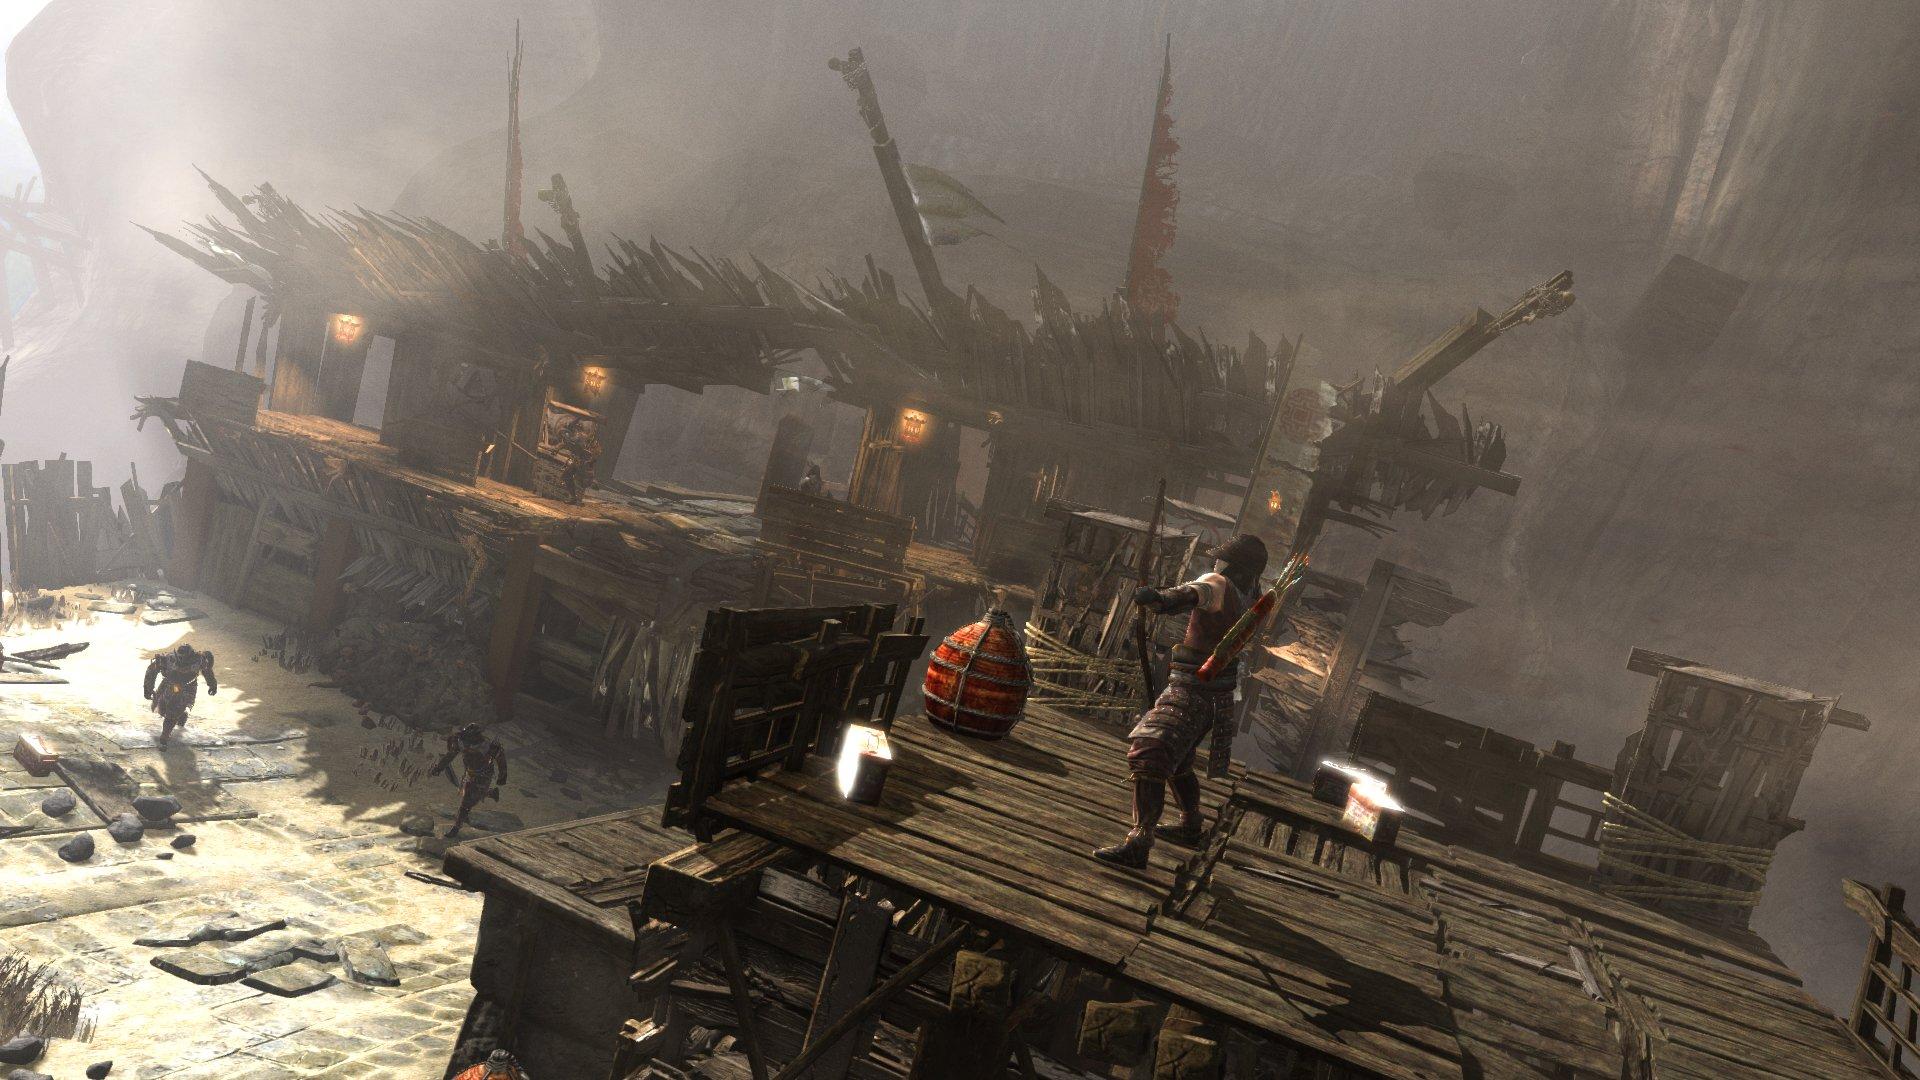 Tomb Raider Screenshots Explore Temple, Fight Samurai #25783